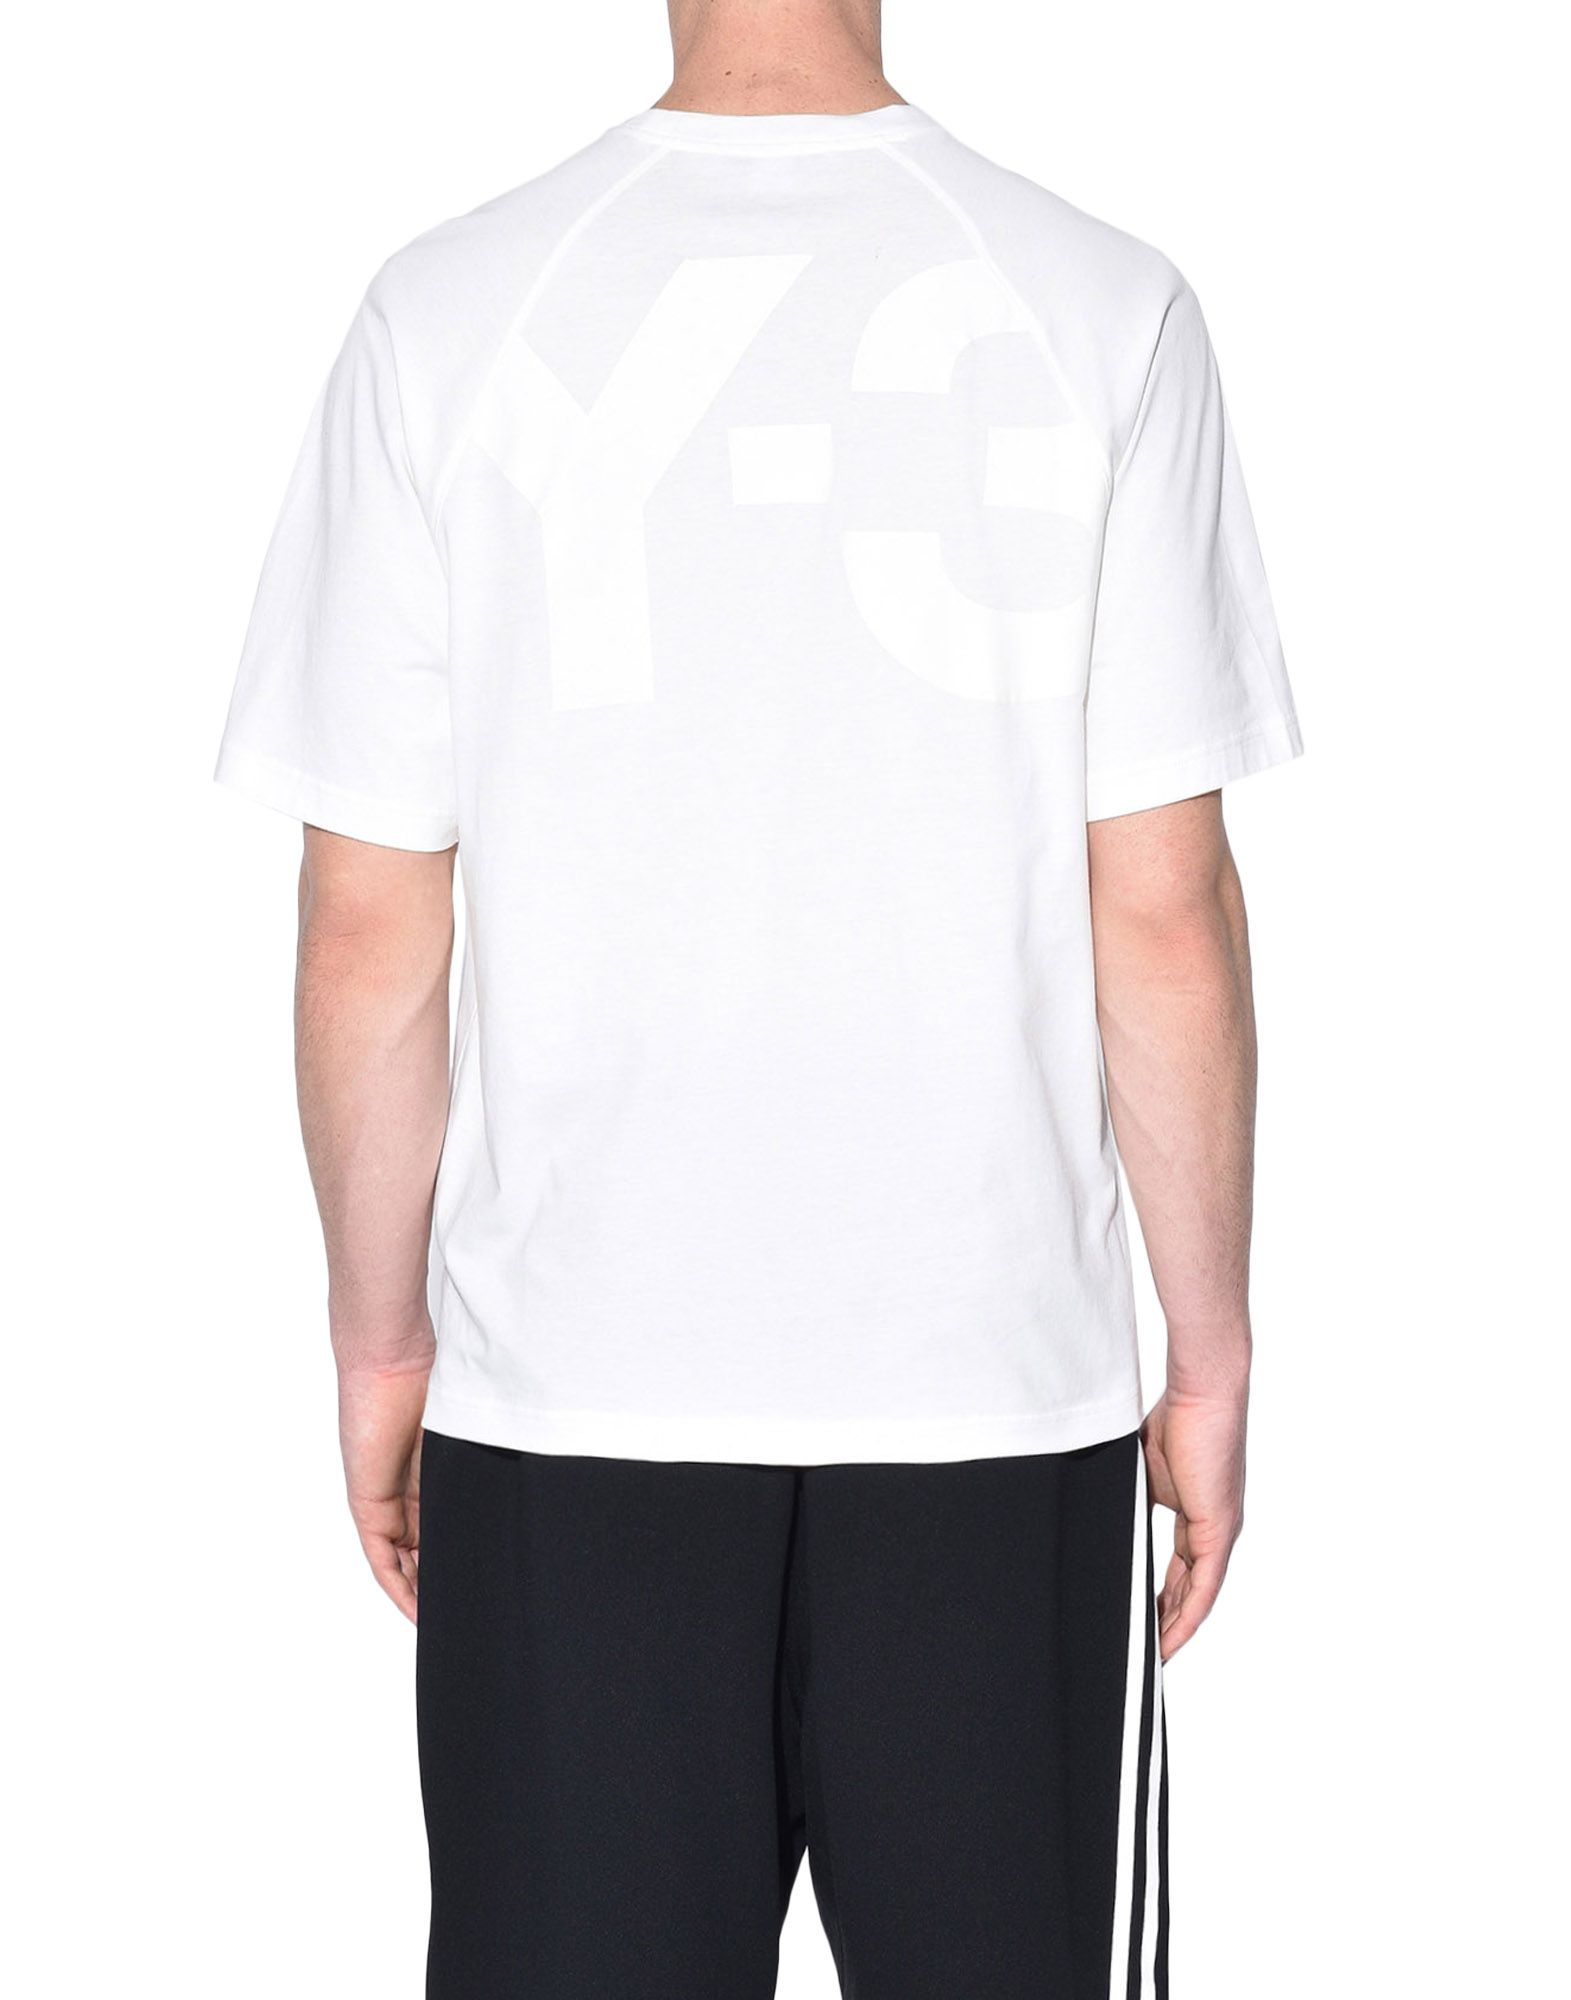 Y-3 Y-3 CLASSIC TEE Short sleeve t-shirt Man e